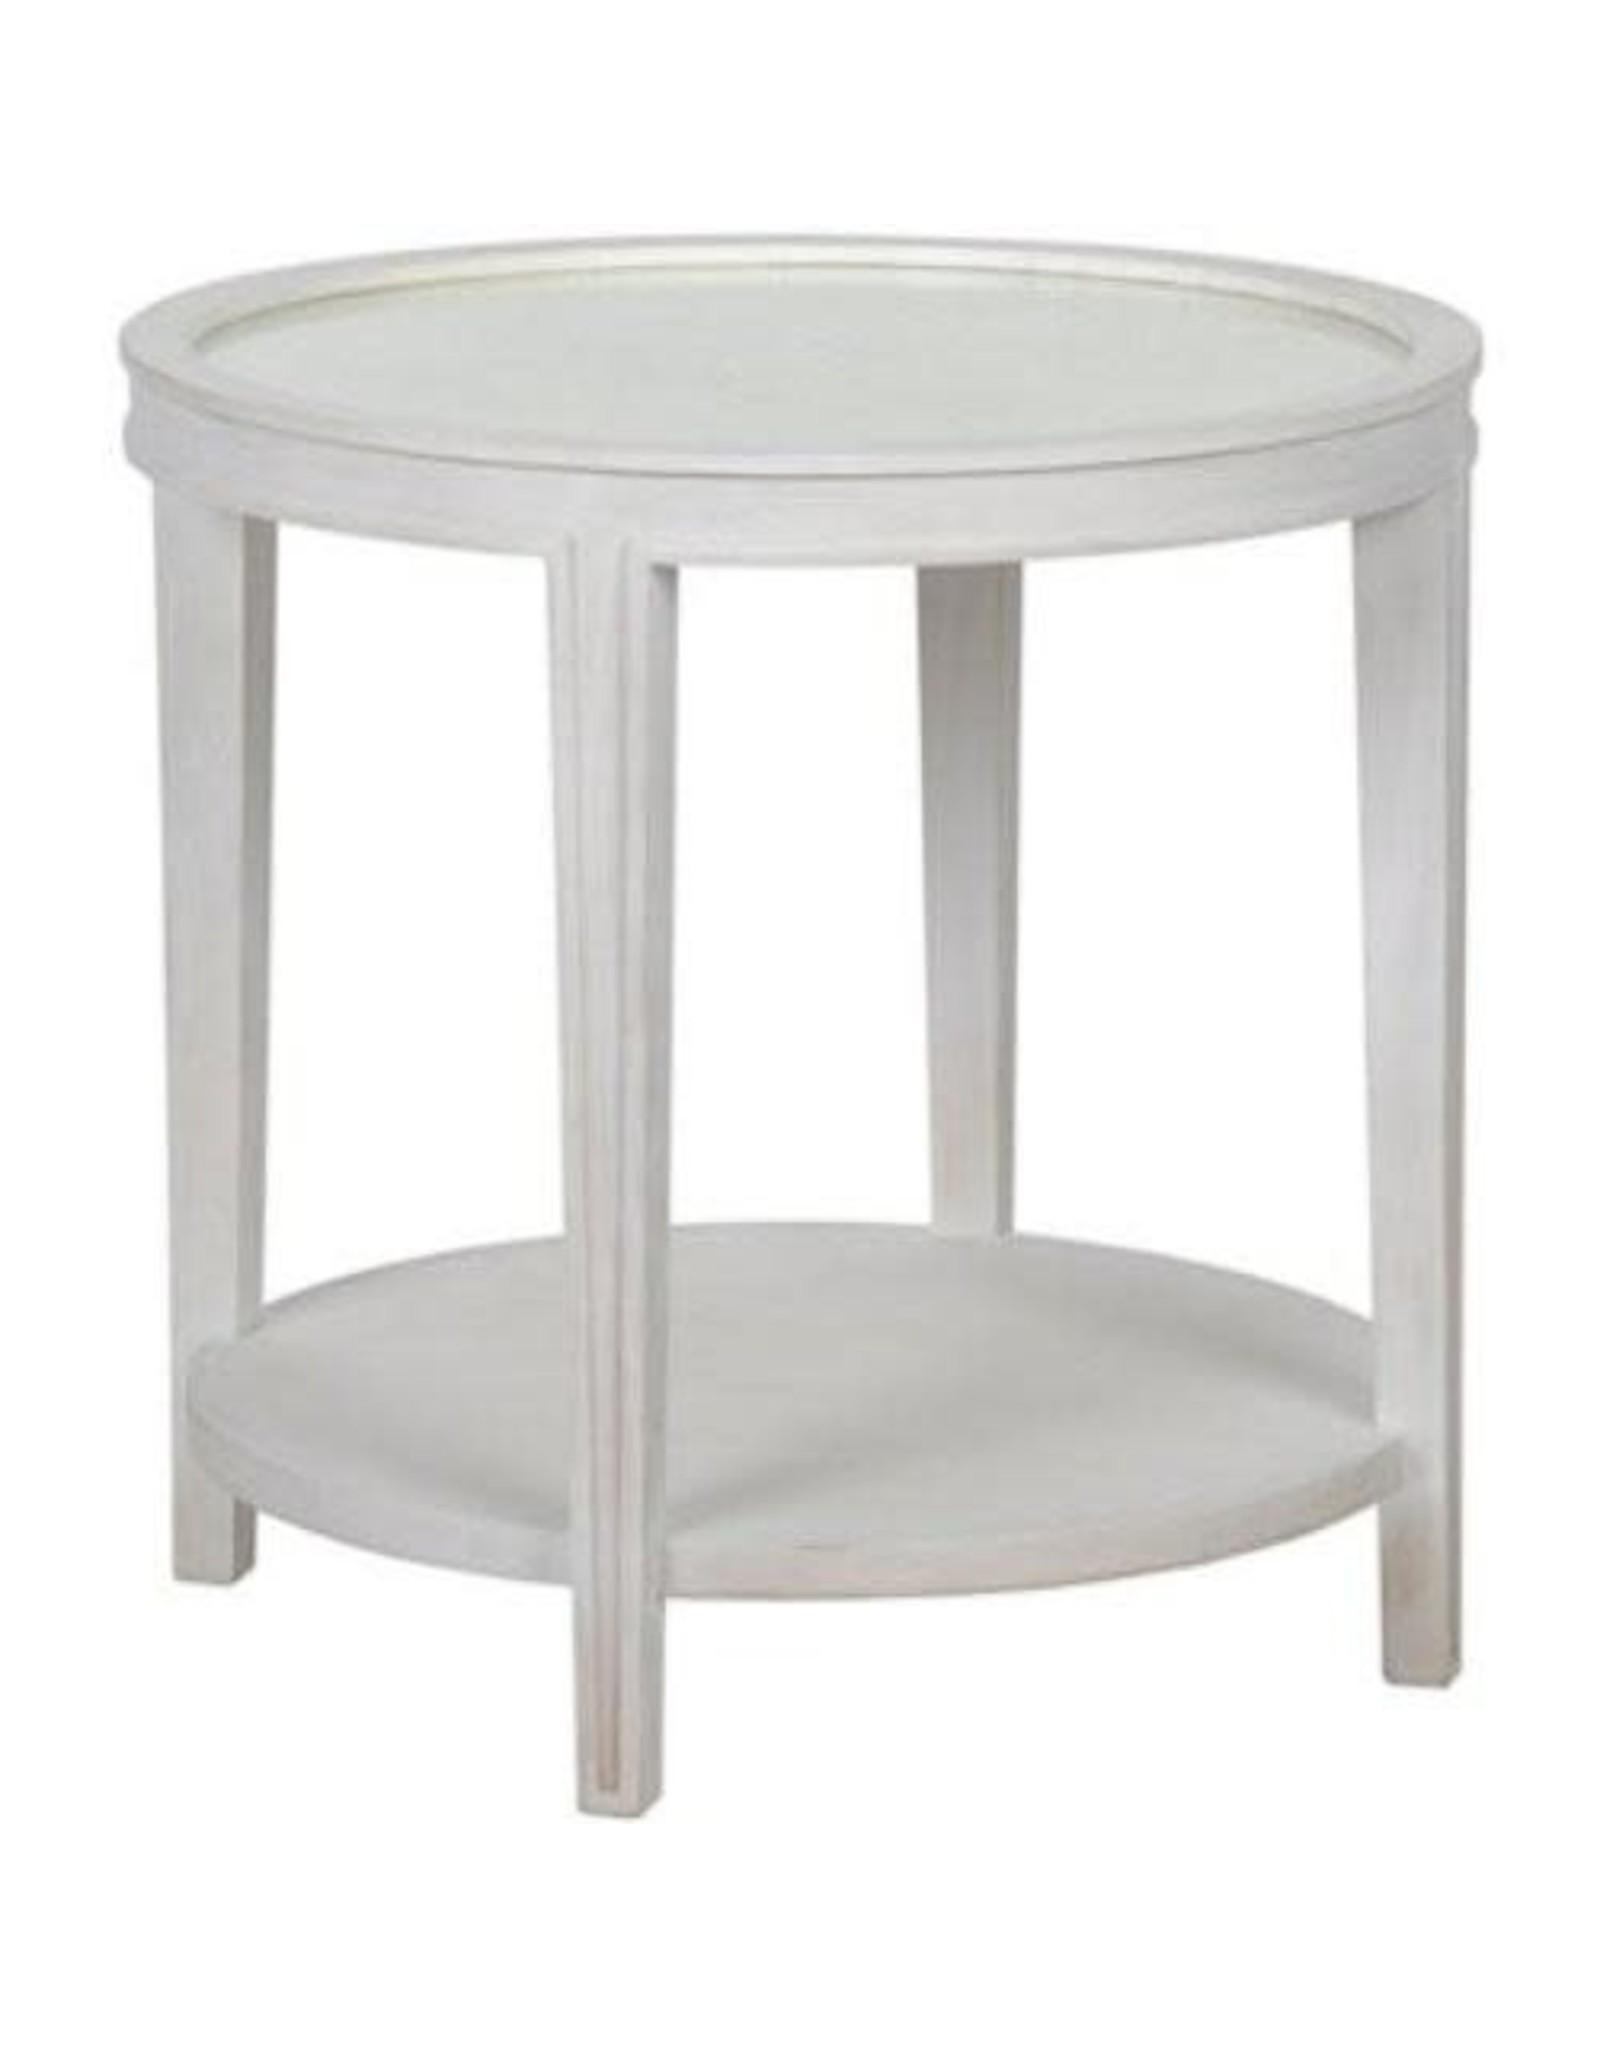 Website Noir Imperial Side Table - White Wash